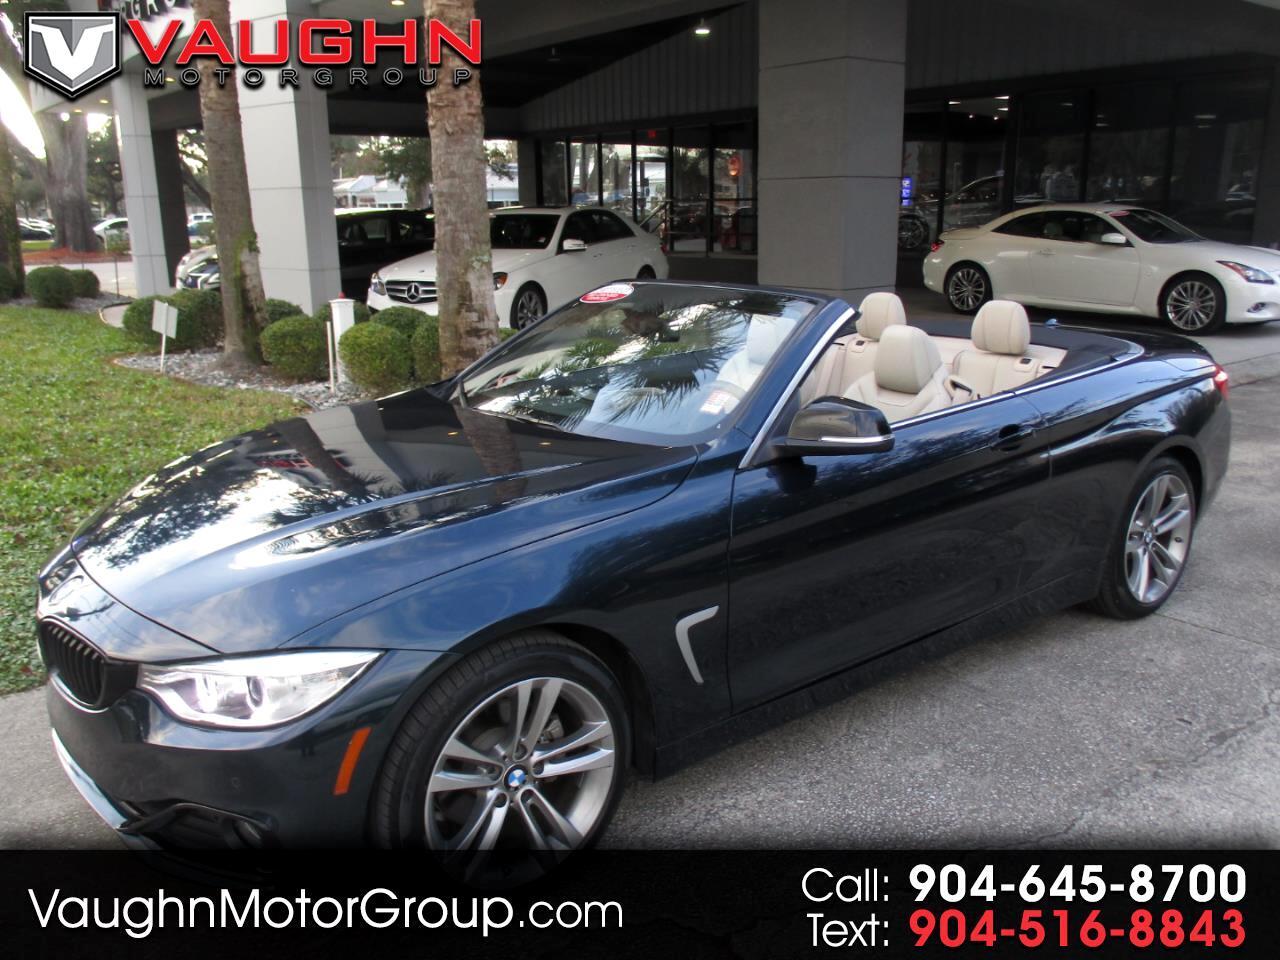 2015 BMW 4 Series 2dr Conv 428i RWD